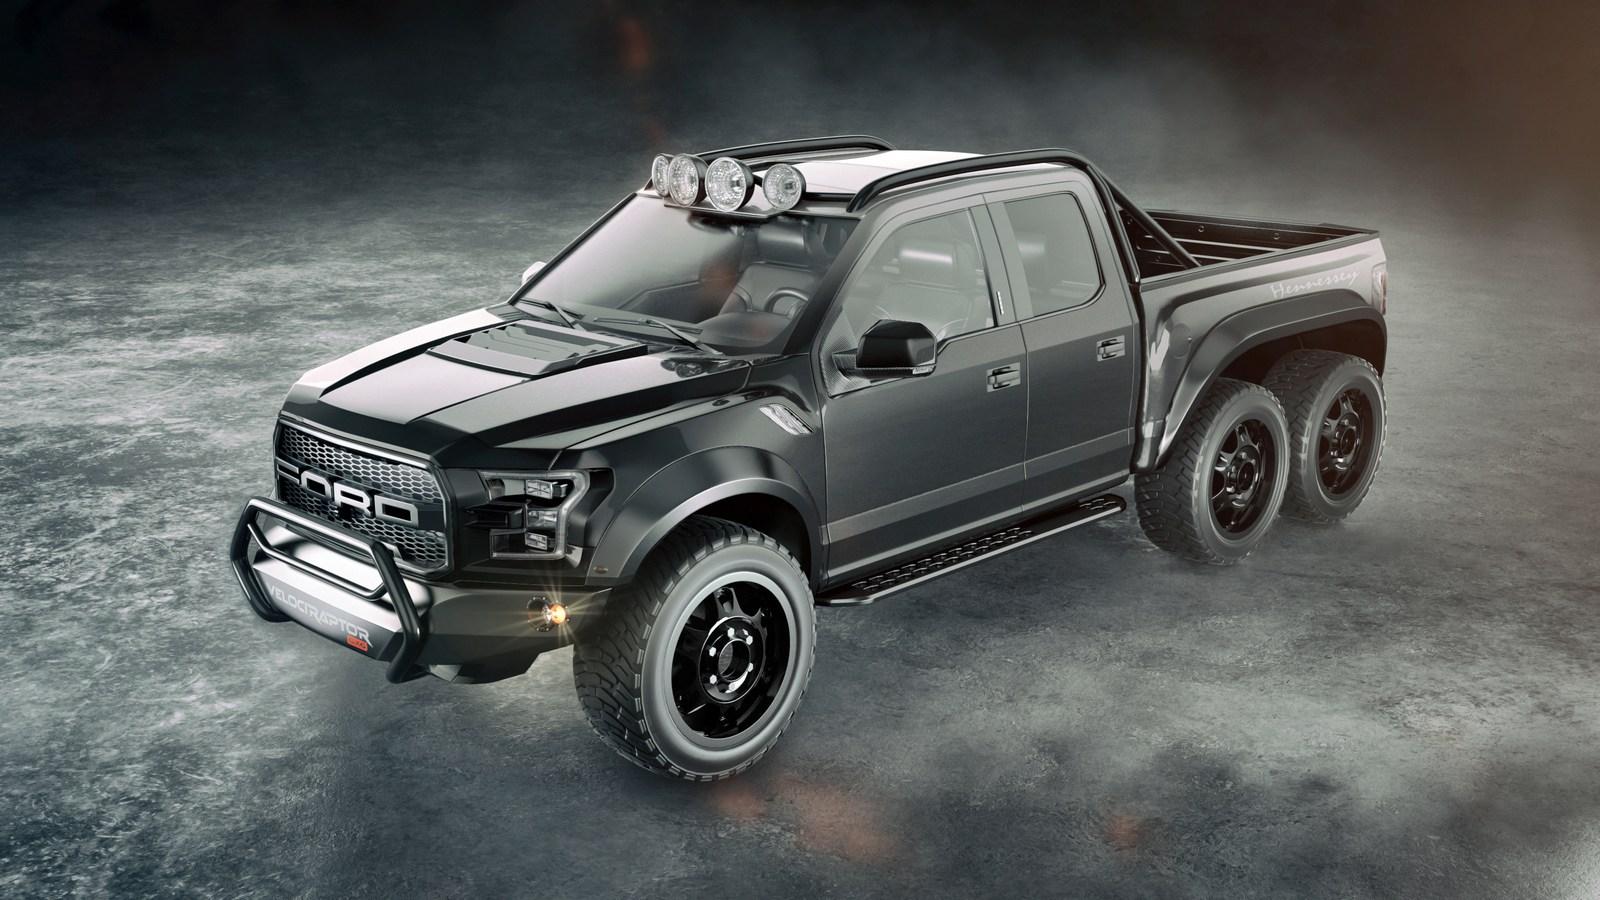 Modifikasi Ford Raptor F-150: Pick-up Monster 6x6